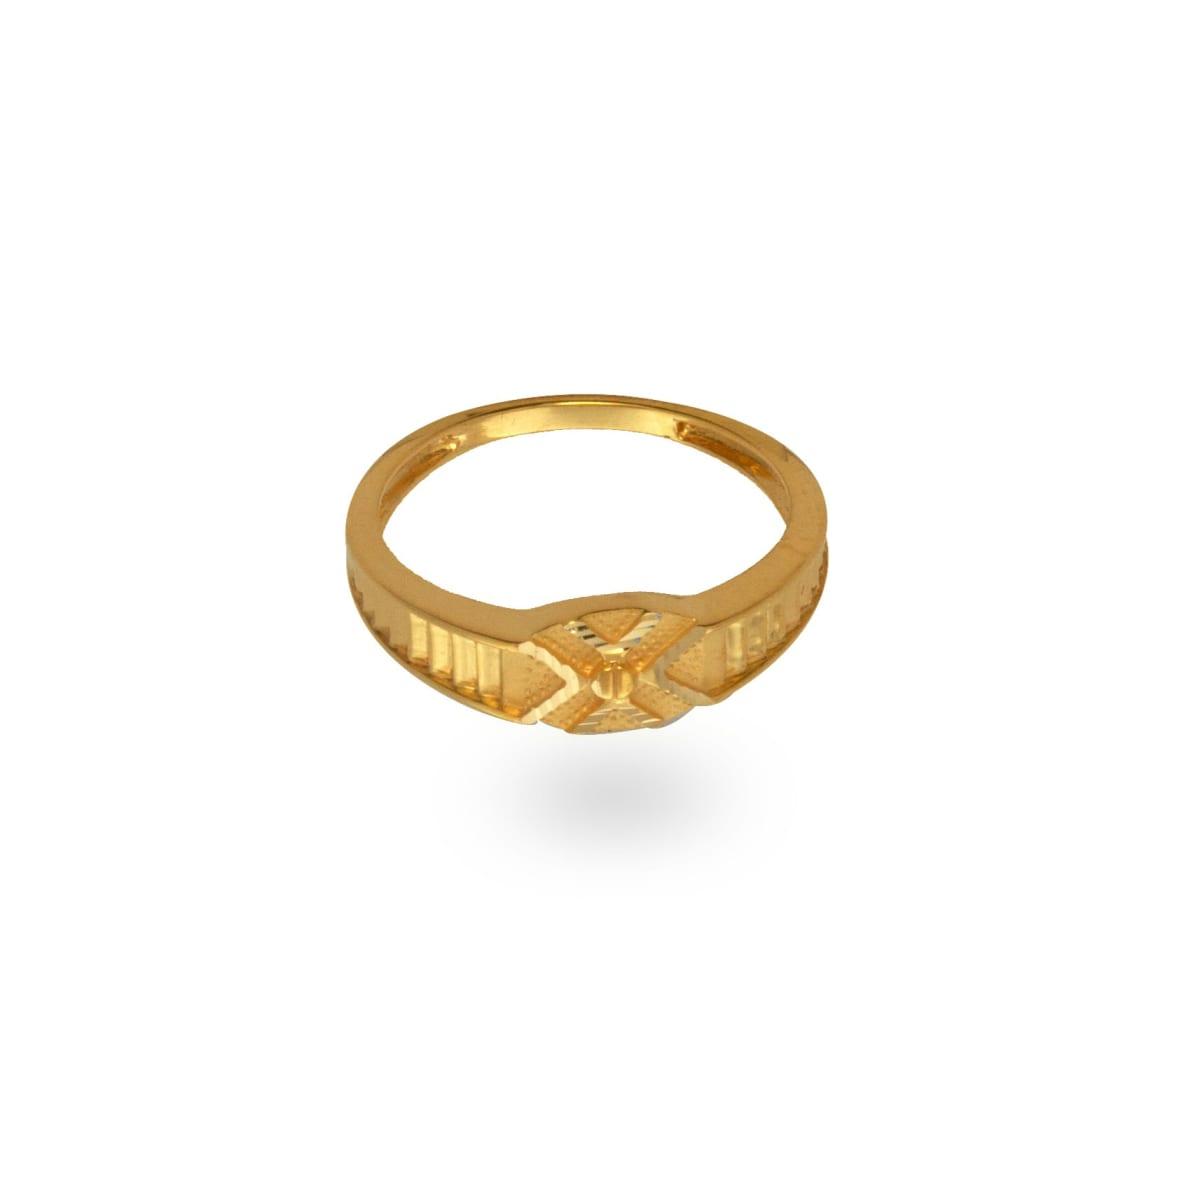 Shah Rukh Gents Ring